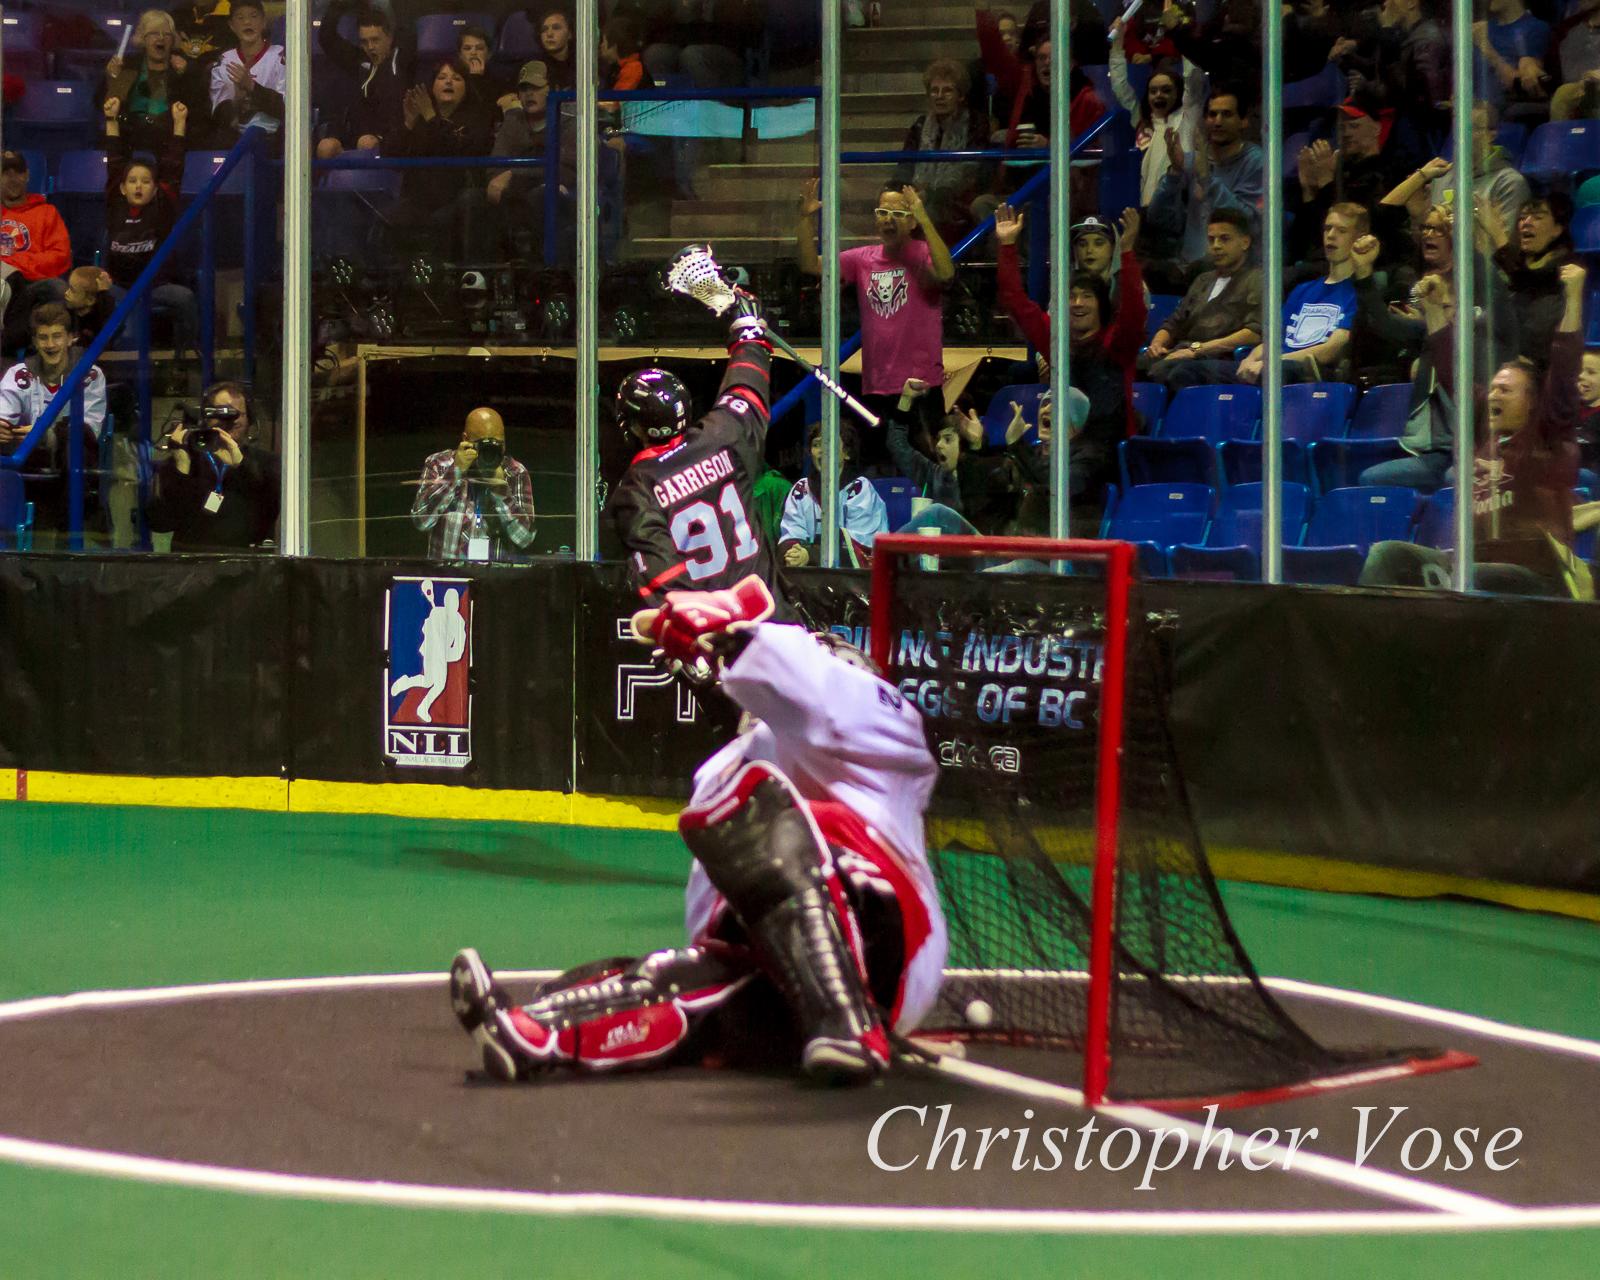 2015-02-14 Tyler Garrison's First Goal.jpg